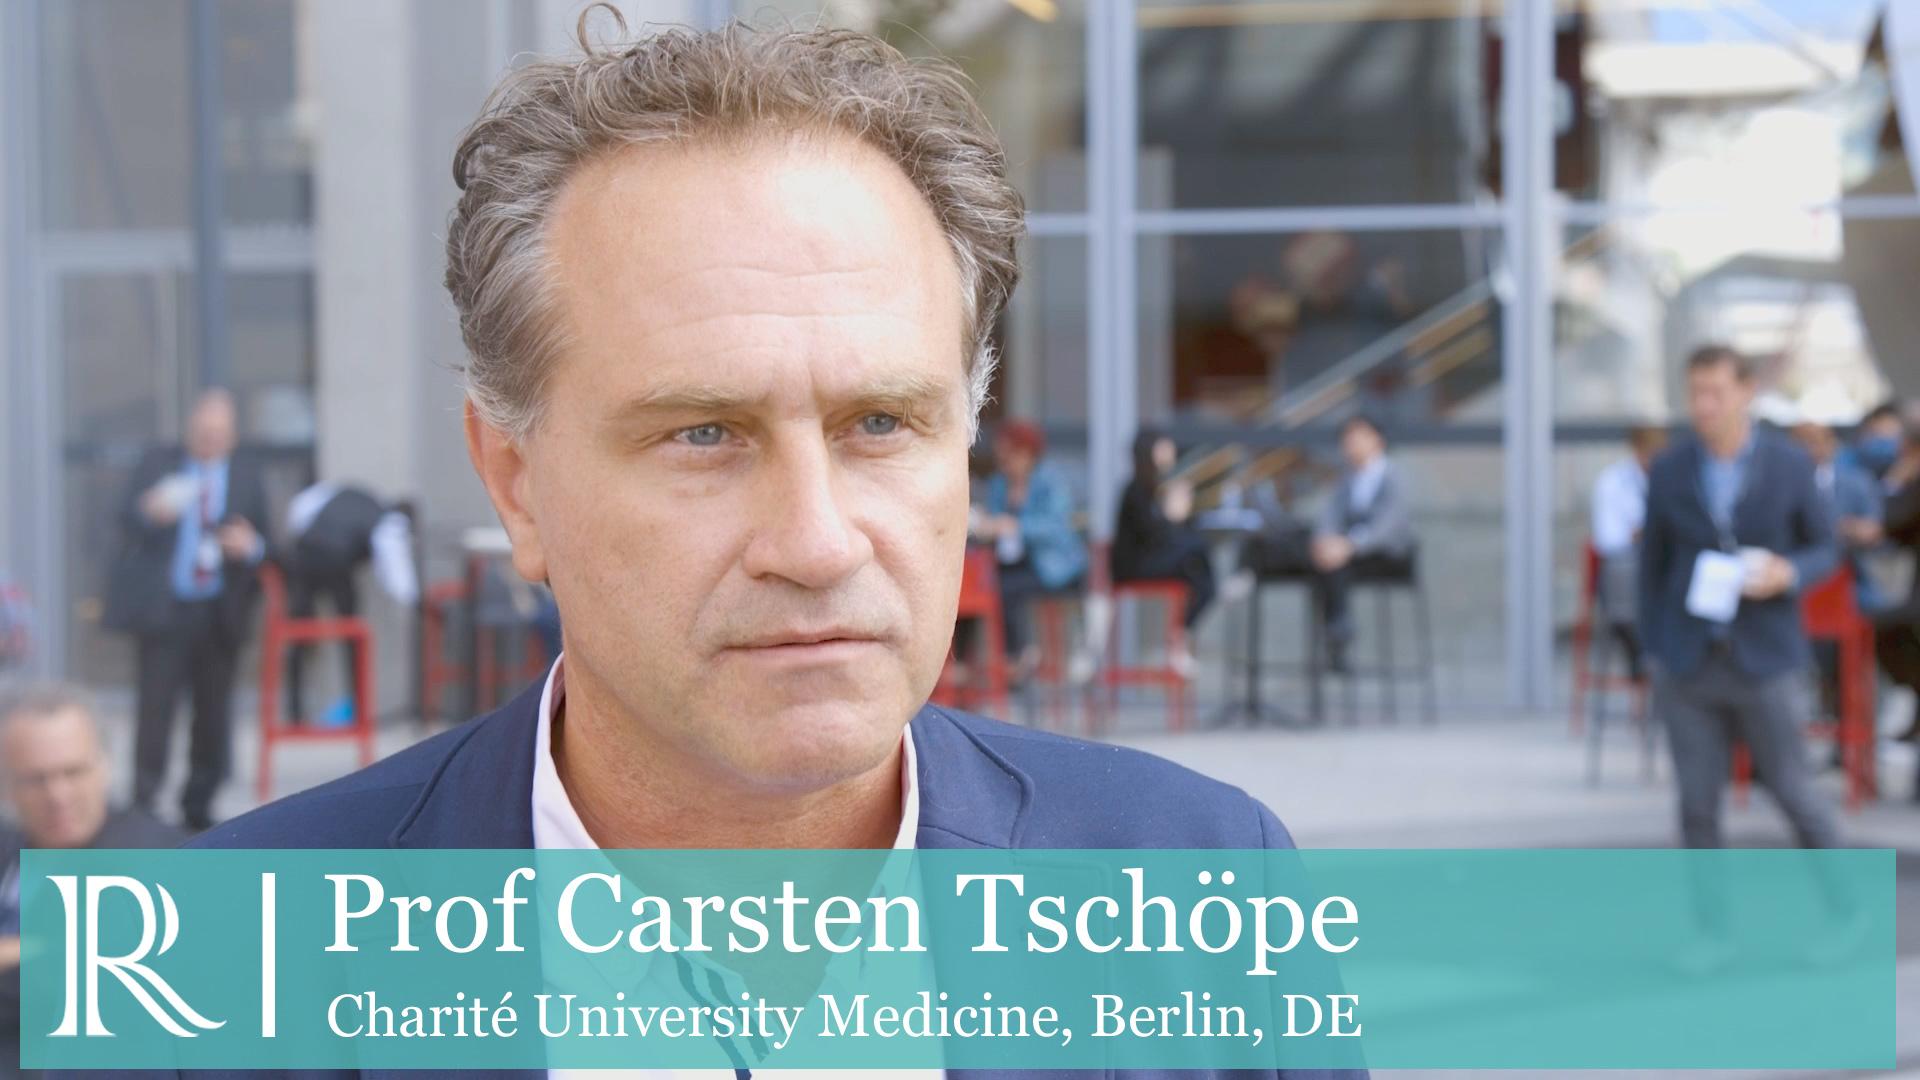 ESC 2019: Treatment strategies for fulminant myocarditis - Prof Carsten Tschöpe